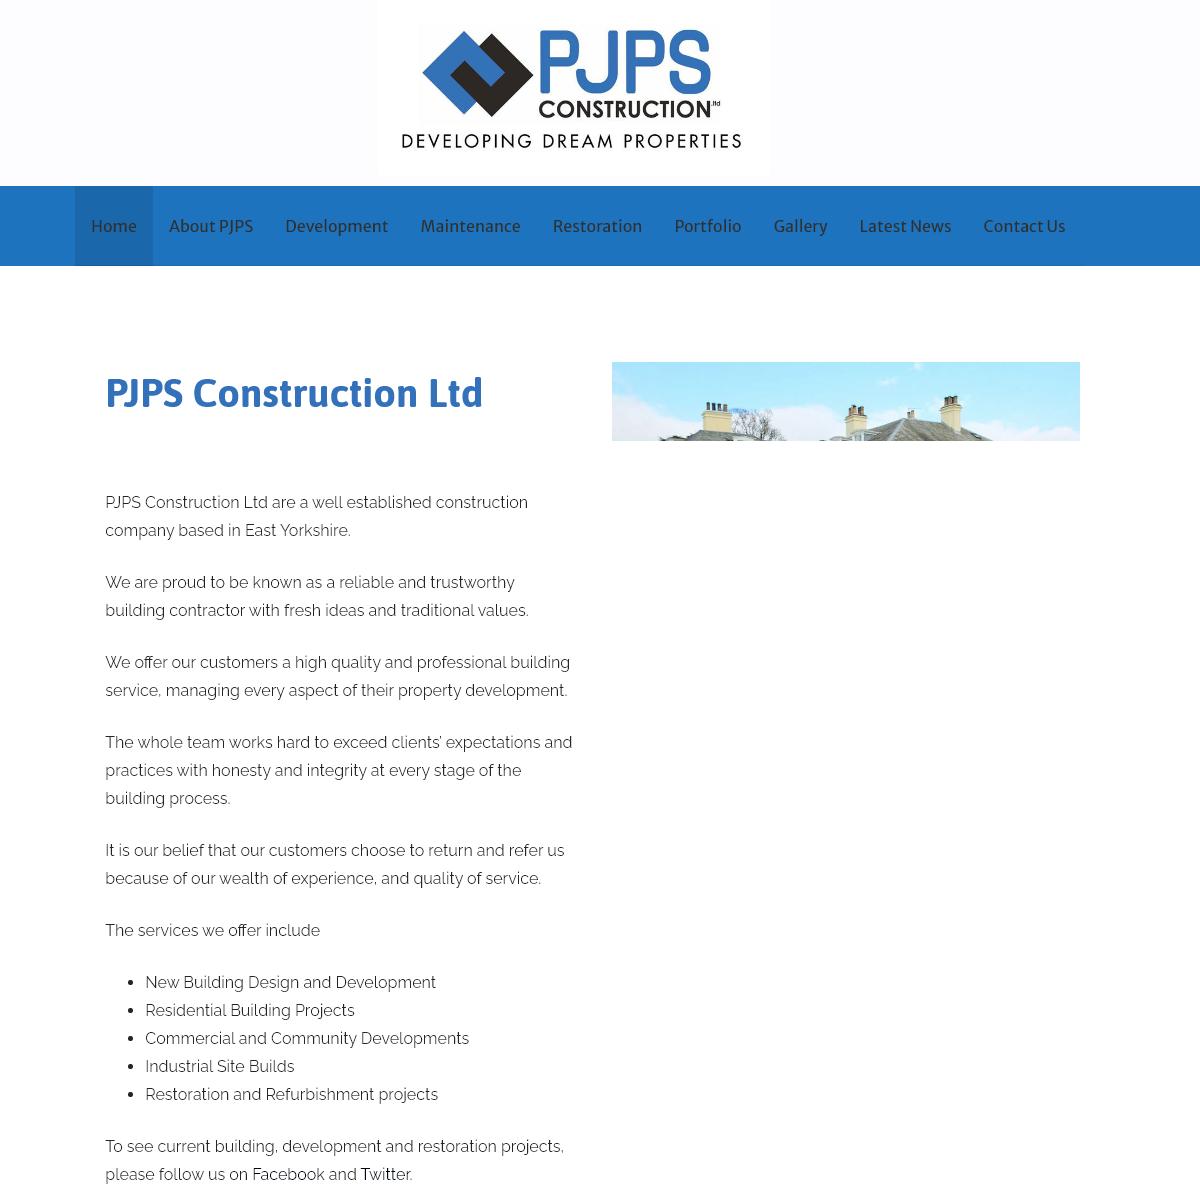 PJPS Construction Ltd – Construction in Beverley, Hull, East Yorkshire